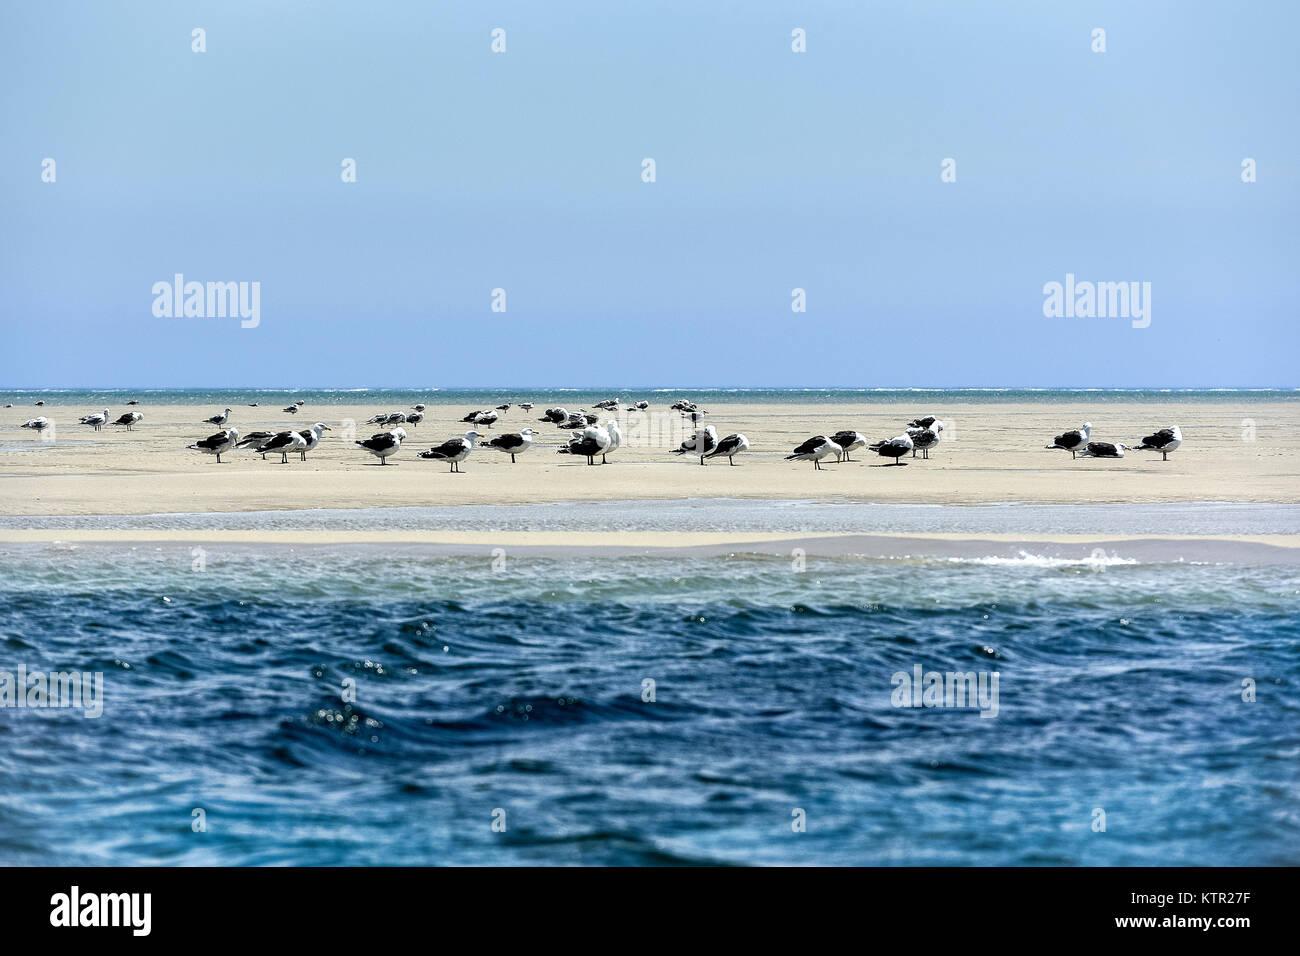 Group of seagulls on a sandbar, Cape Cod, Massachusetts, USA. - Stock Image